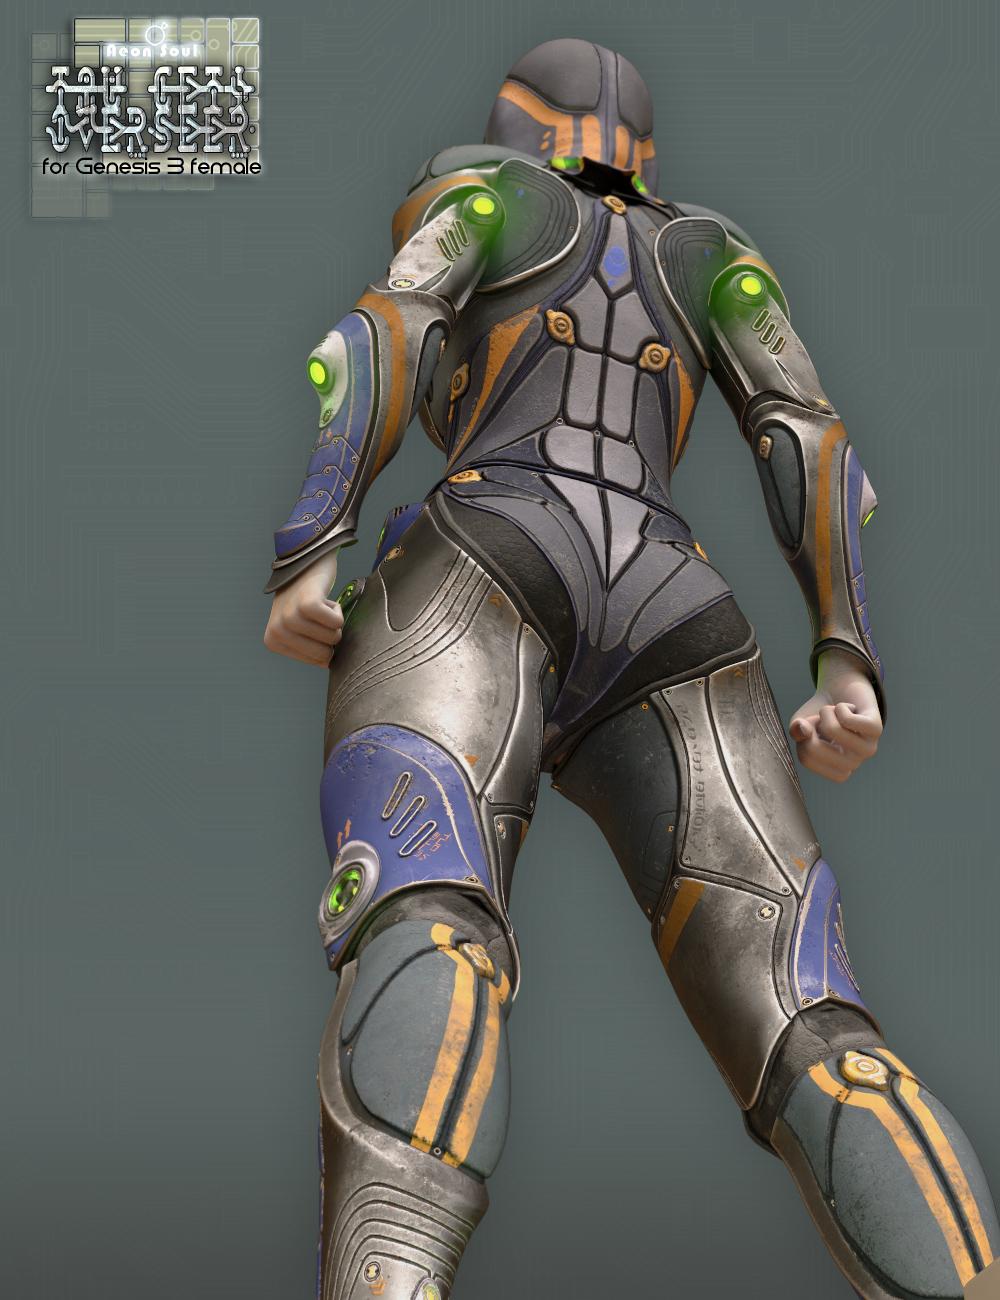 Tau Ceti Overseer - Sci-fi Armor for Genesis 3 Female(s) by: Aeon Soul, 3D Models by Daz 3D